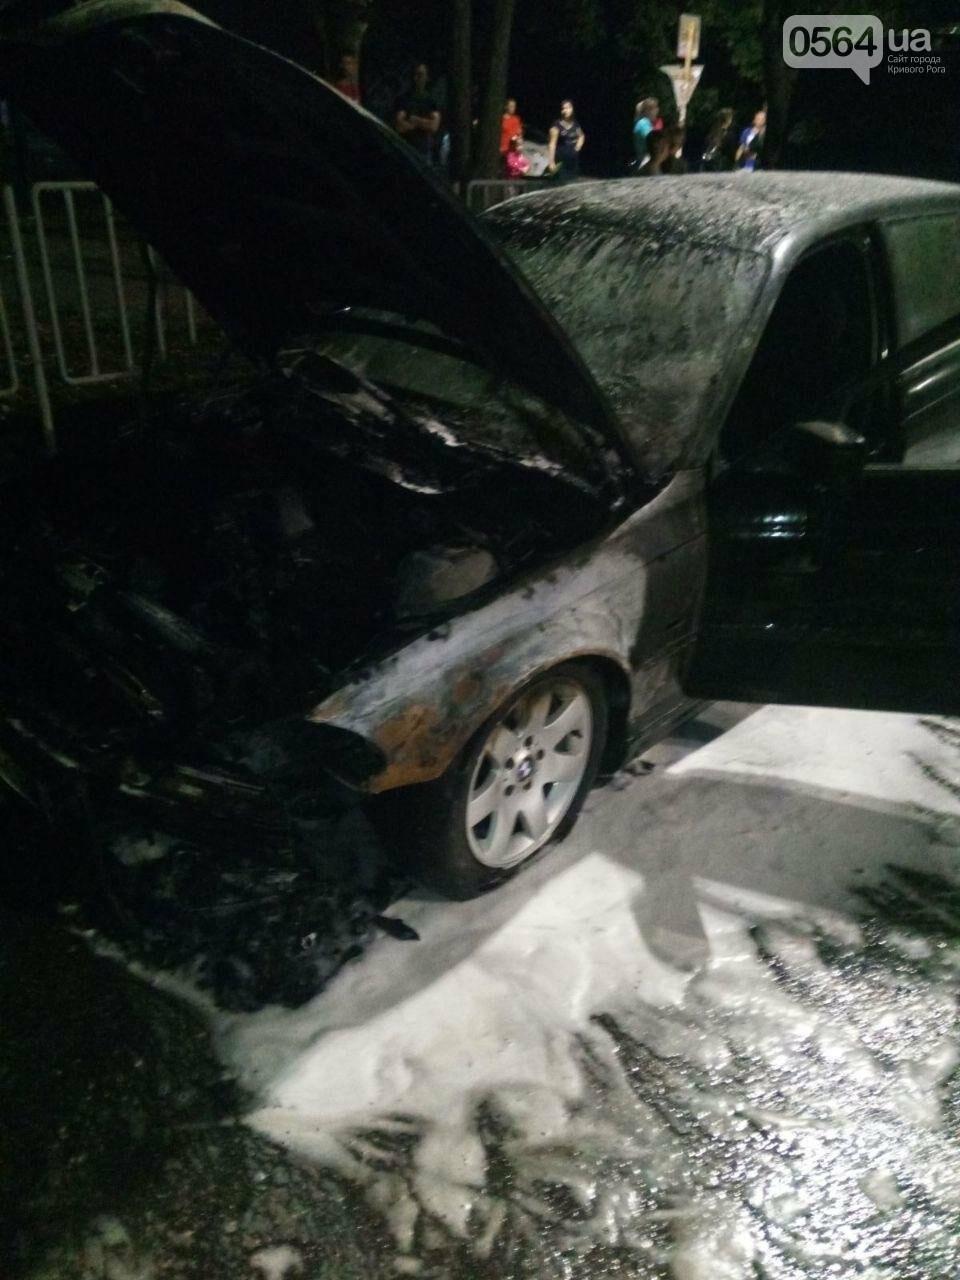 В Кривом Роге на ходу загорелась иномарка, - ФОТО, фото-3